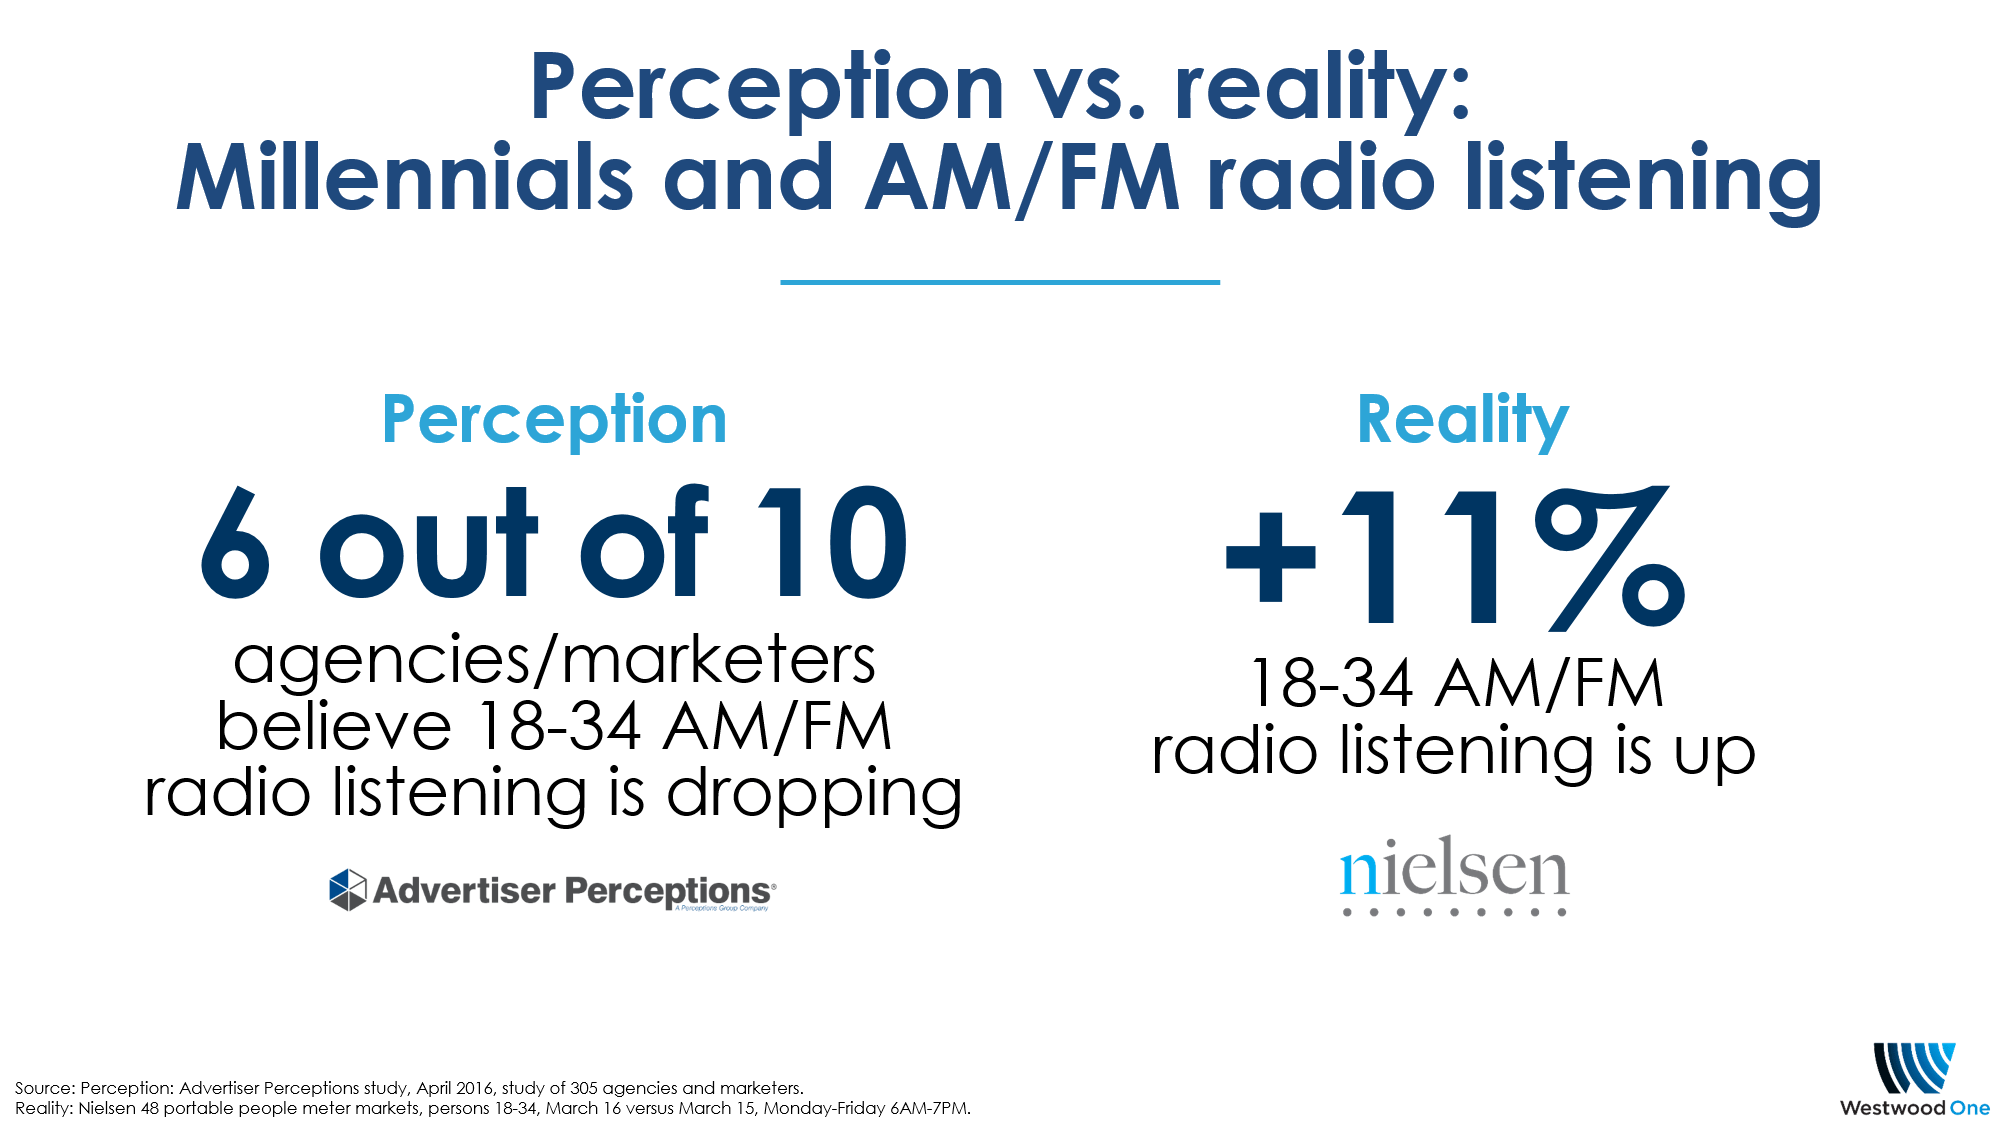 Perception vs Reality: Is AM/FM listening among Millenials